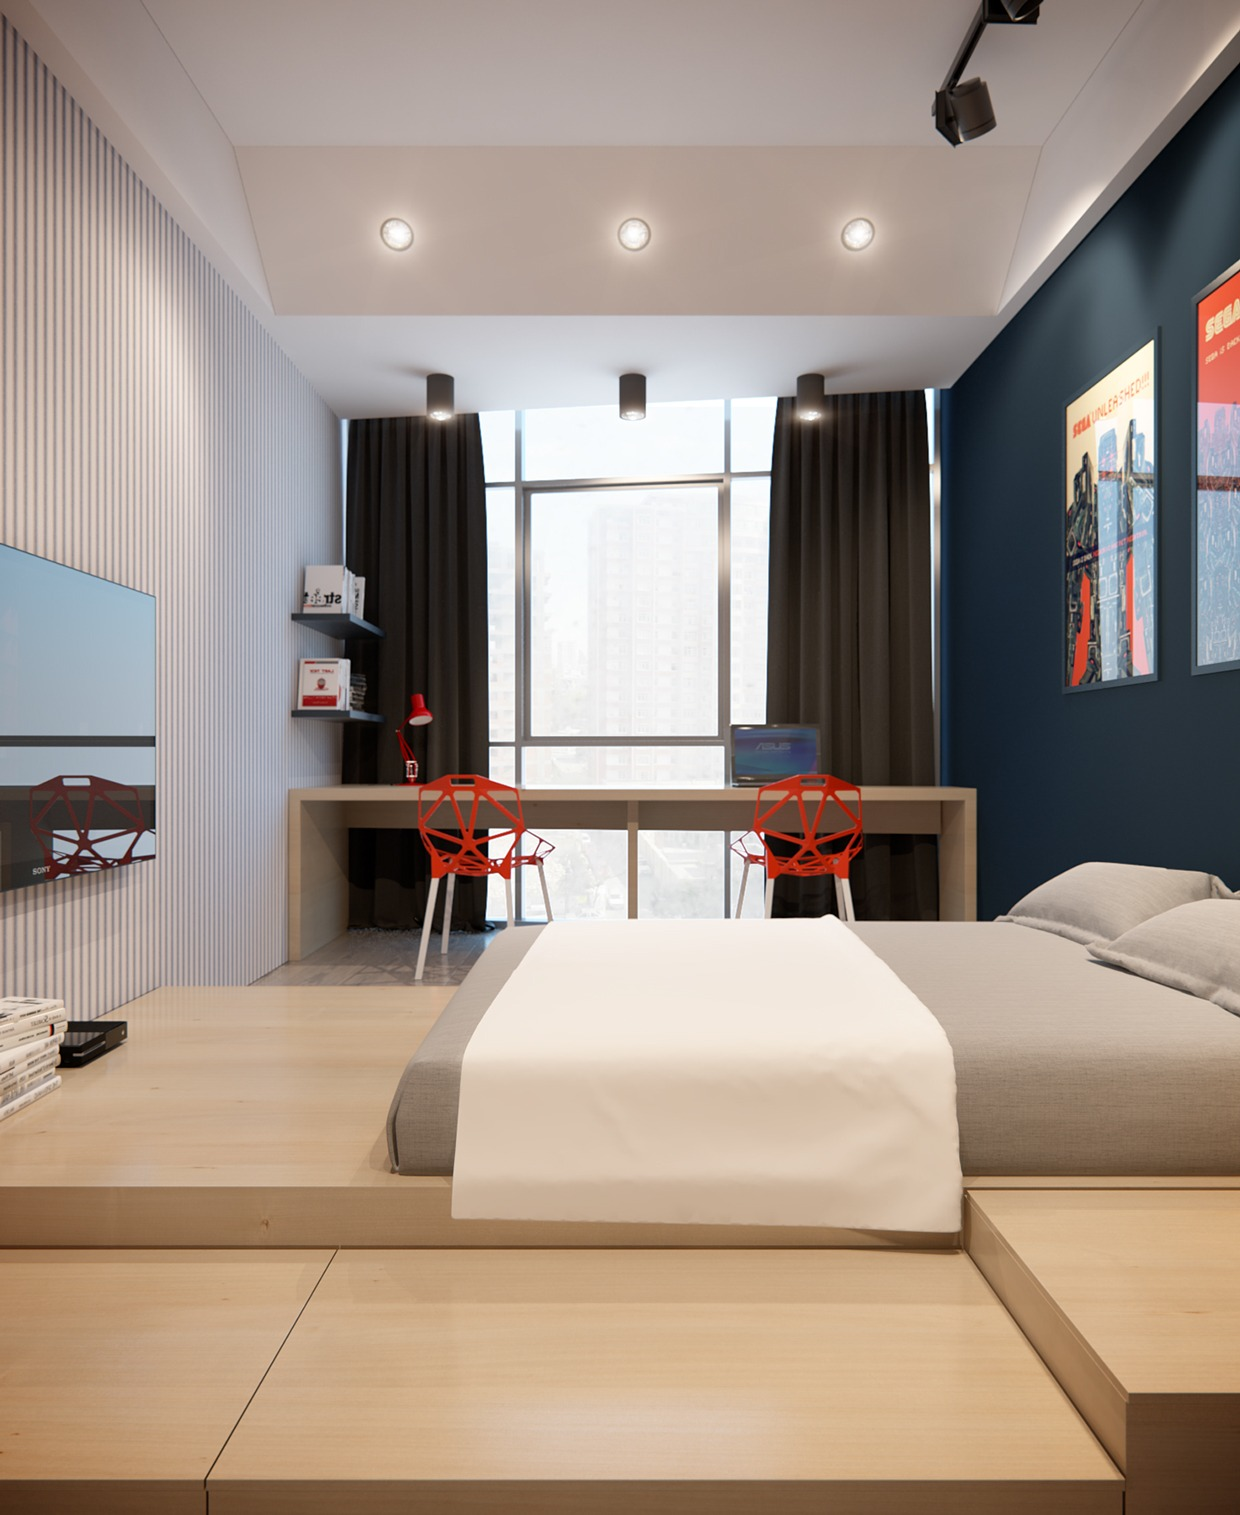 Creative bedroom decoration